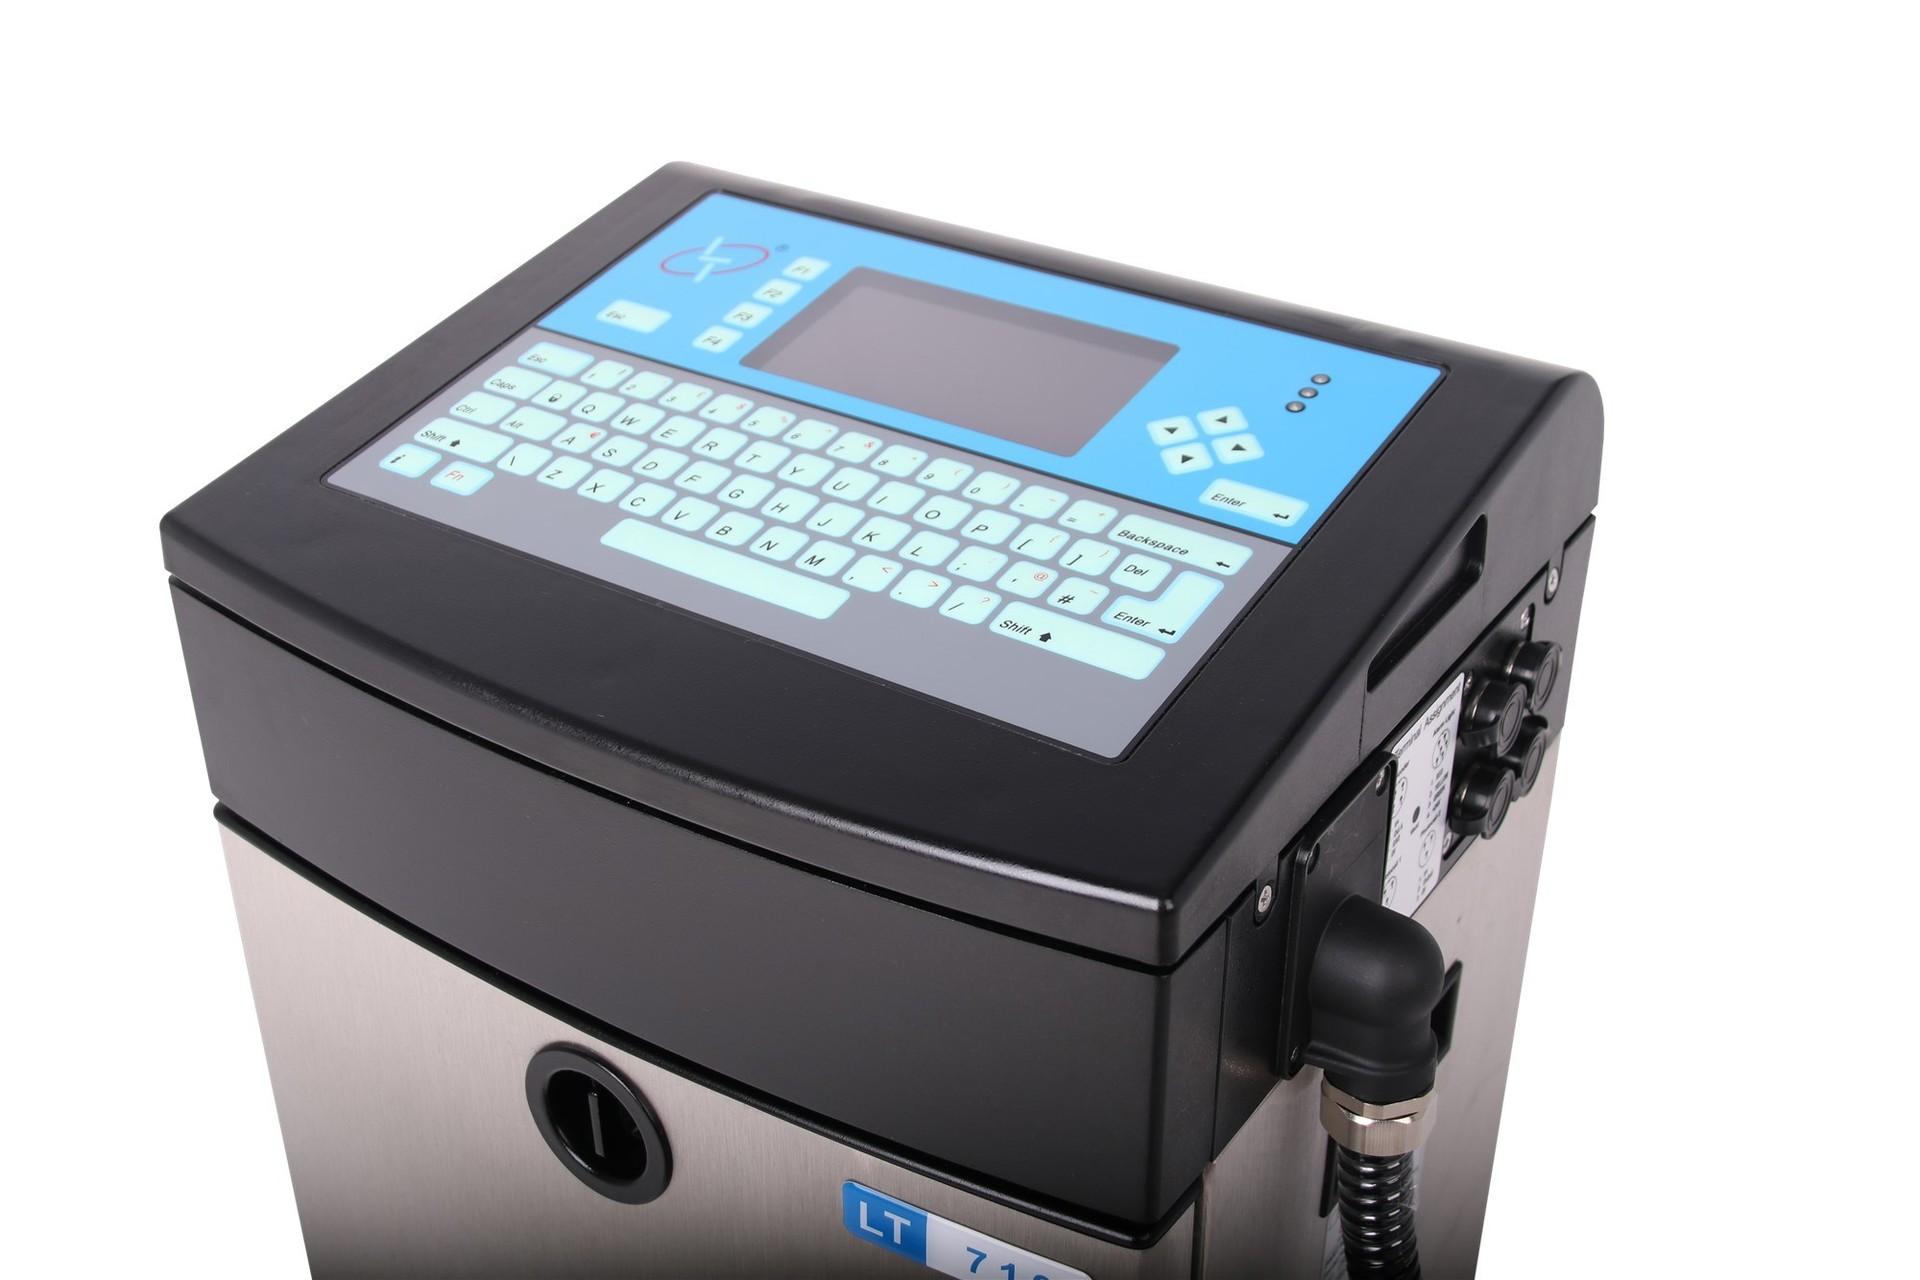 Lead Tech Lt710 Reverse Printing Cij Inkjet Printer